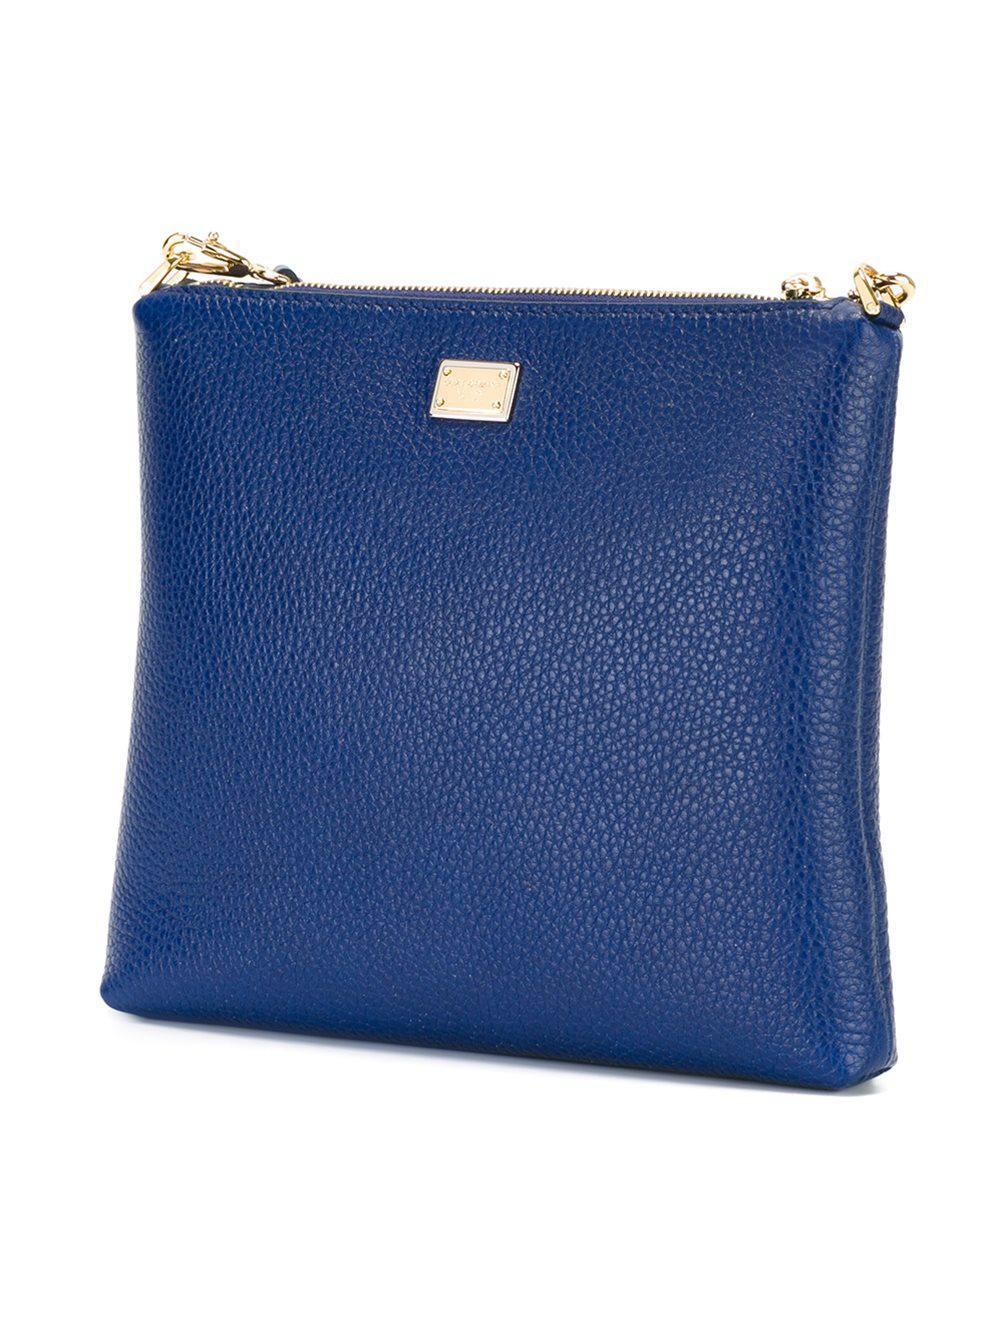 2c9bd3518e44 Lyst - Dolce   Gabbana Family Patch Crossbody Bag in Blue